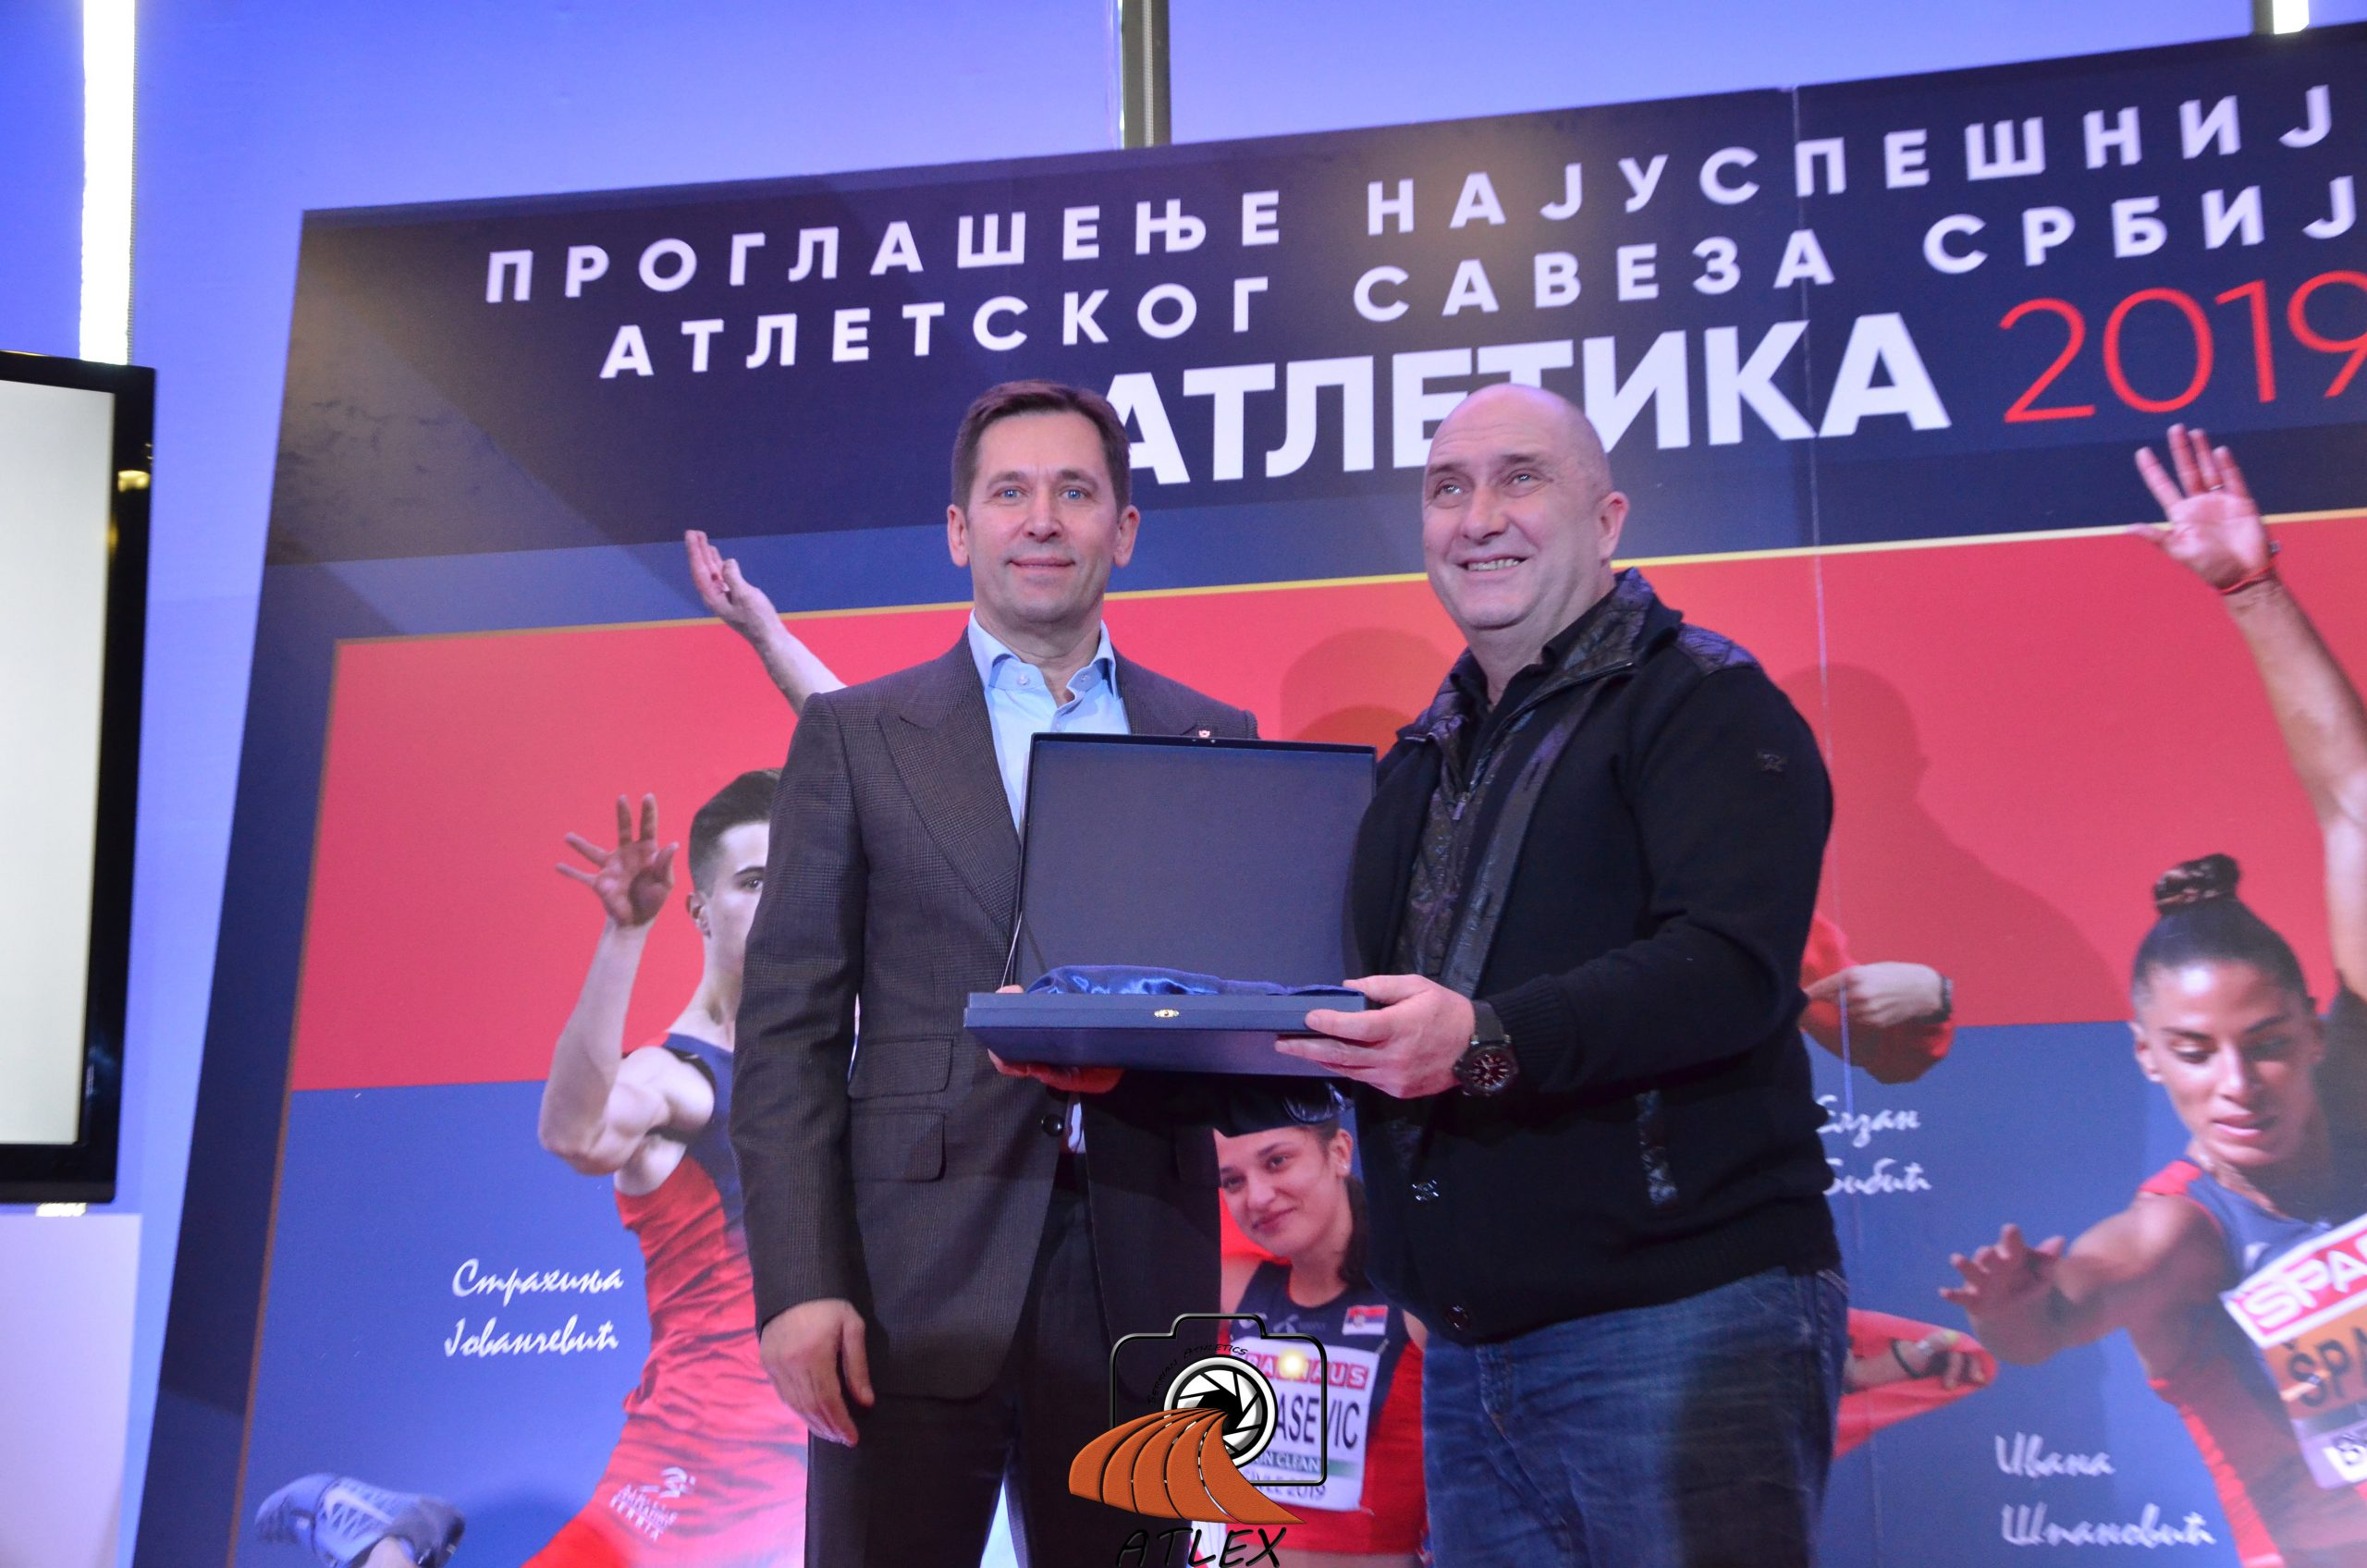 Milan Pavlović Mane, generalni direktor Partizana 1945 prima priznanje za najbolji klub u Srbiji za 2019.